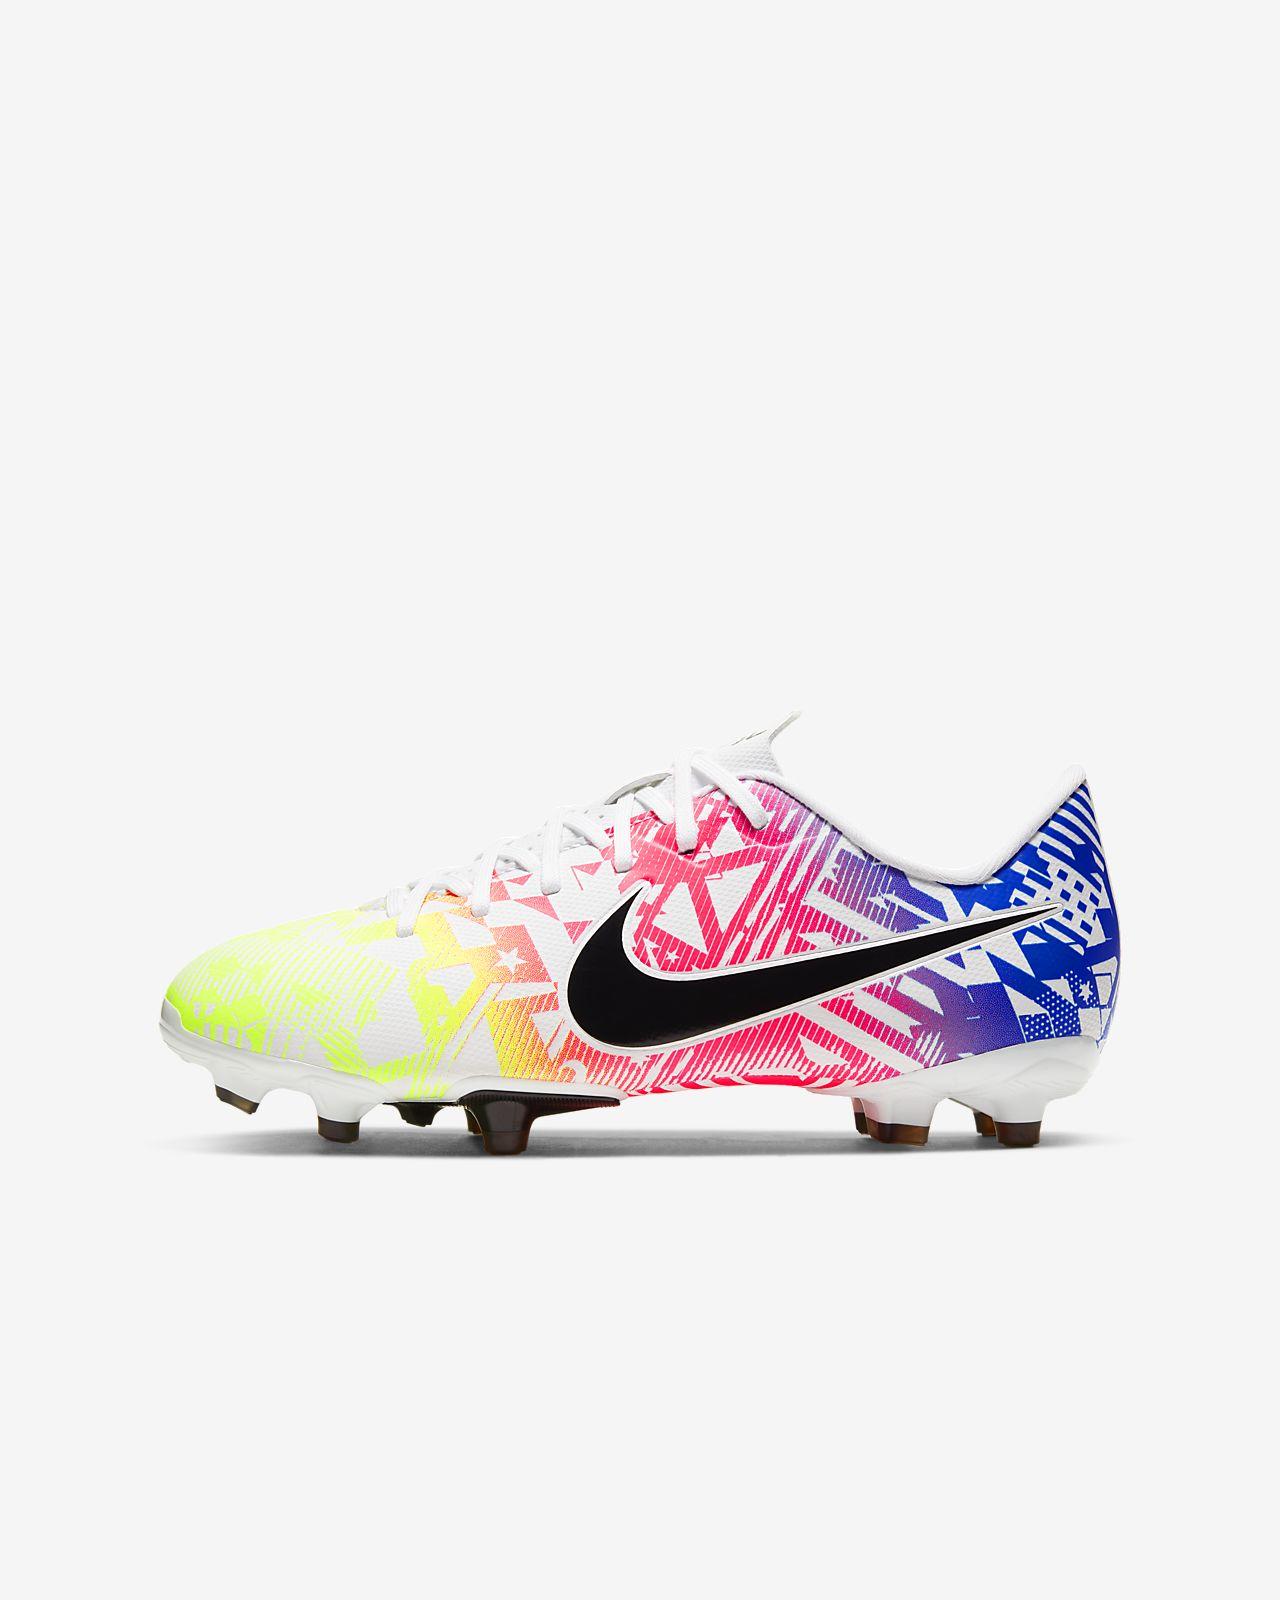 Scarpa da calcio multiterreno Nike Jr. Mercurial Vapor 13 Academy Neymar Jr. MG Bambini